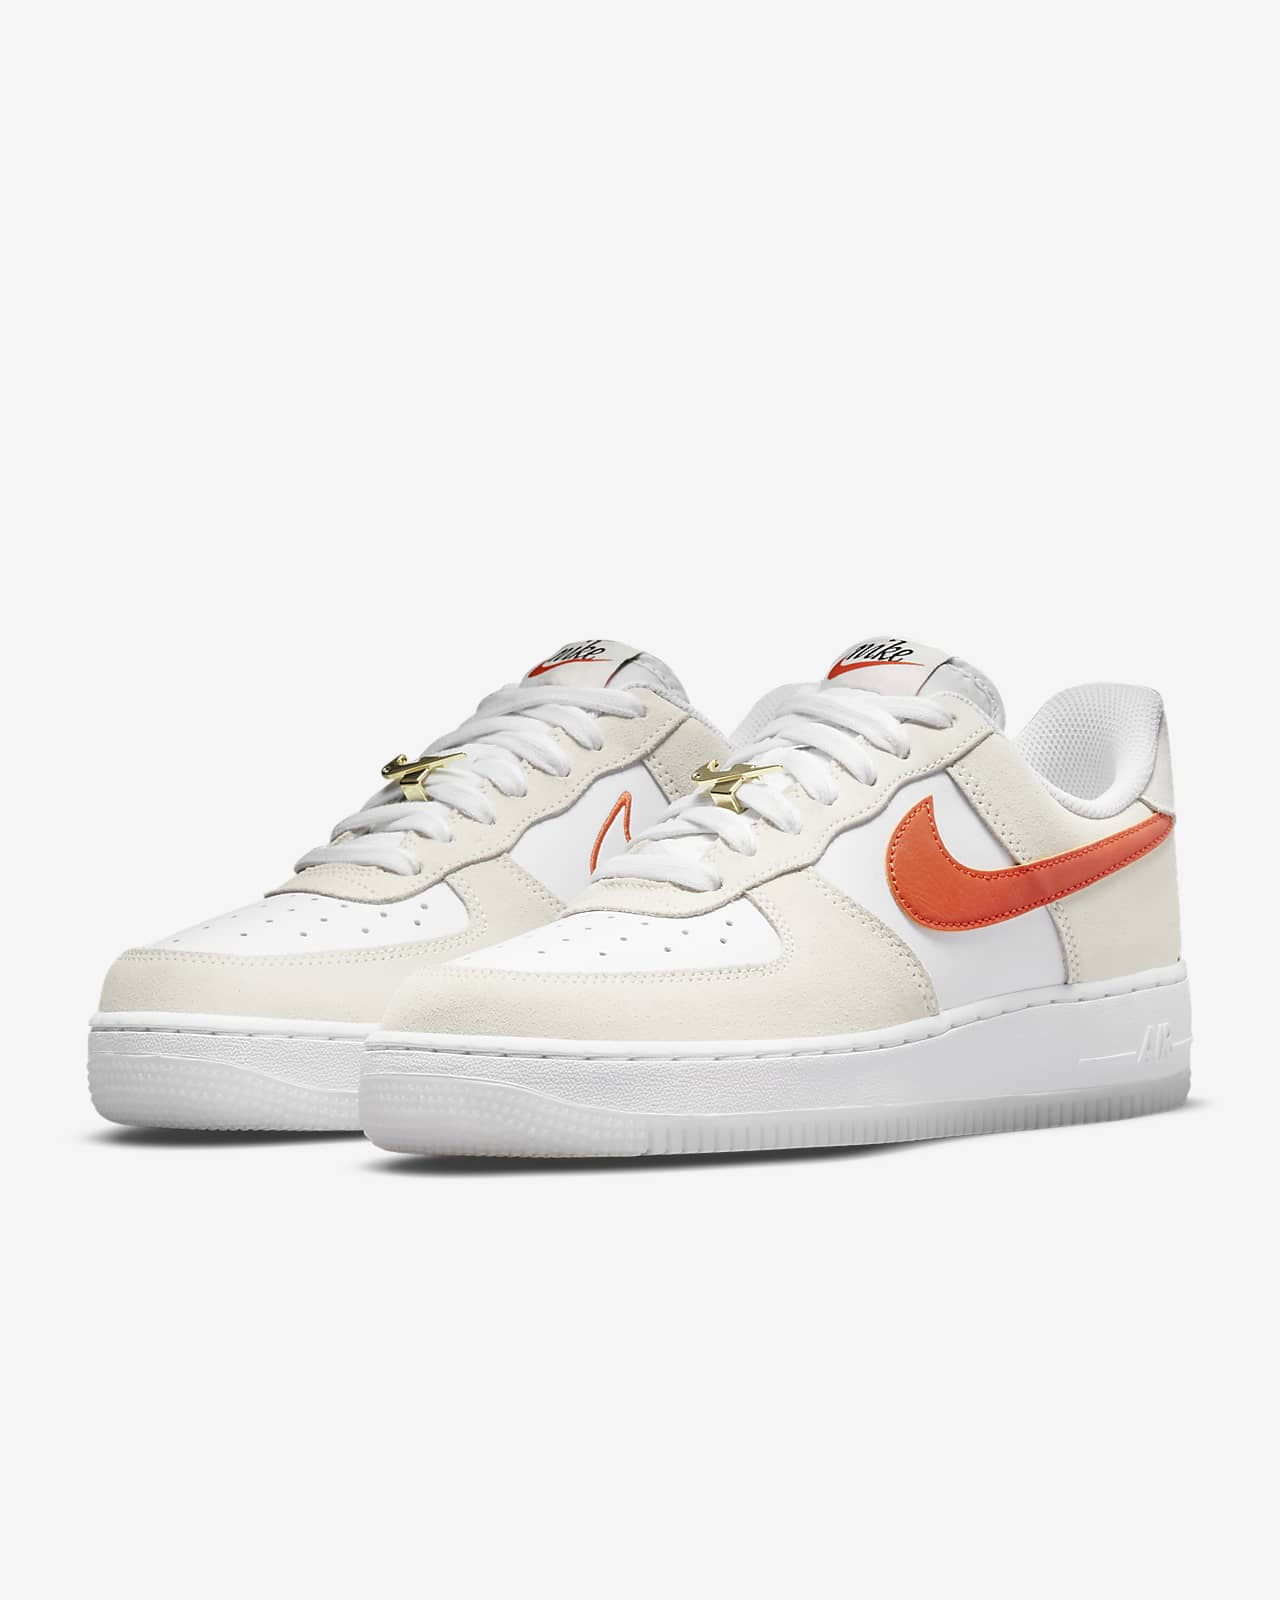 Chaussure Nike Air Force 1 '07 SE pour Femme. Nike LU